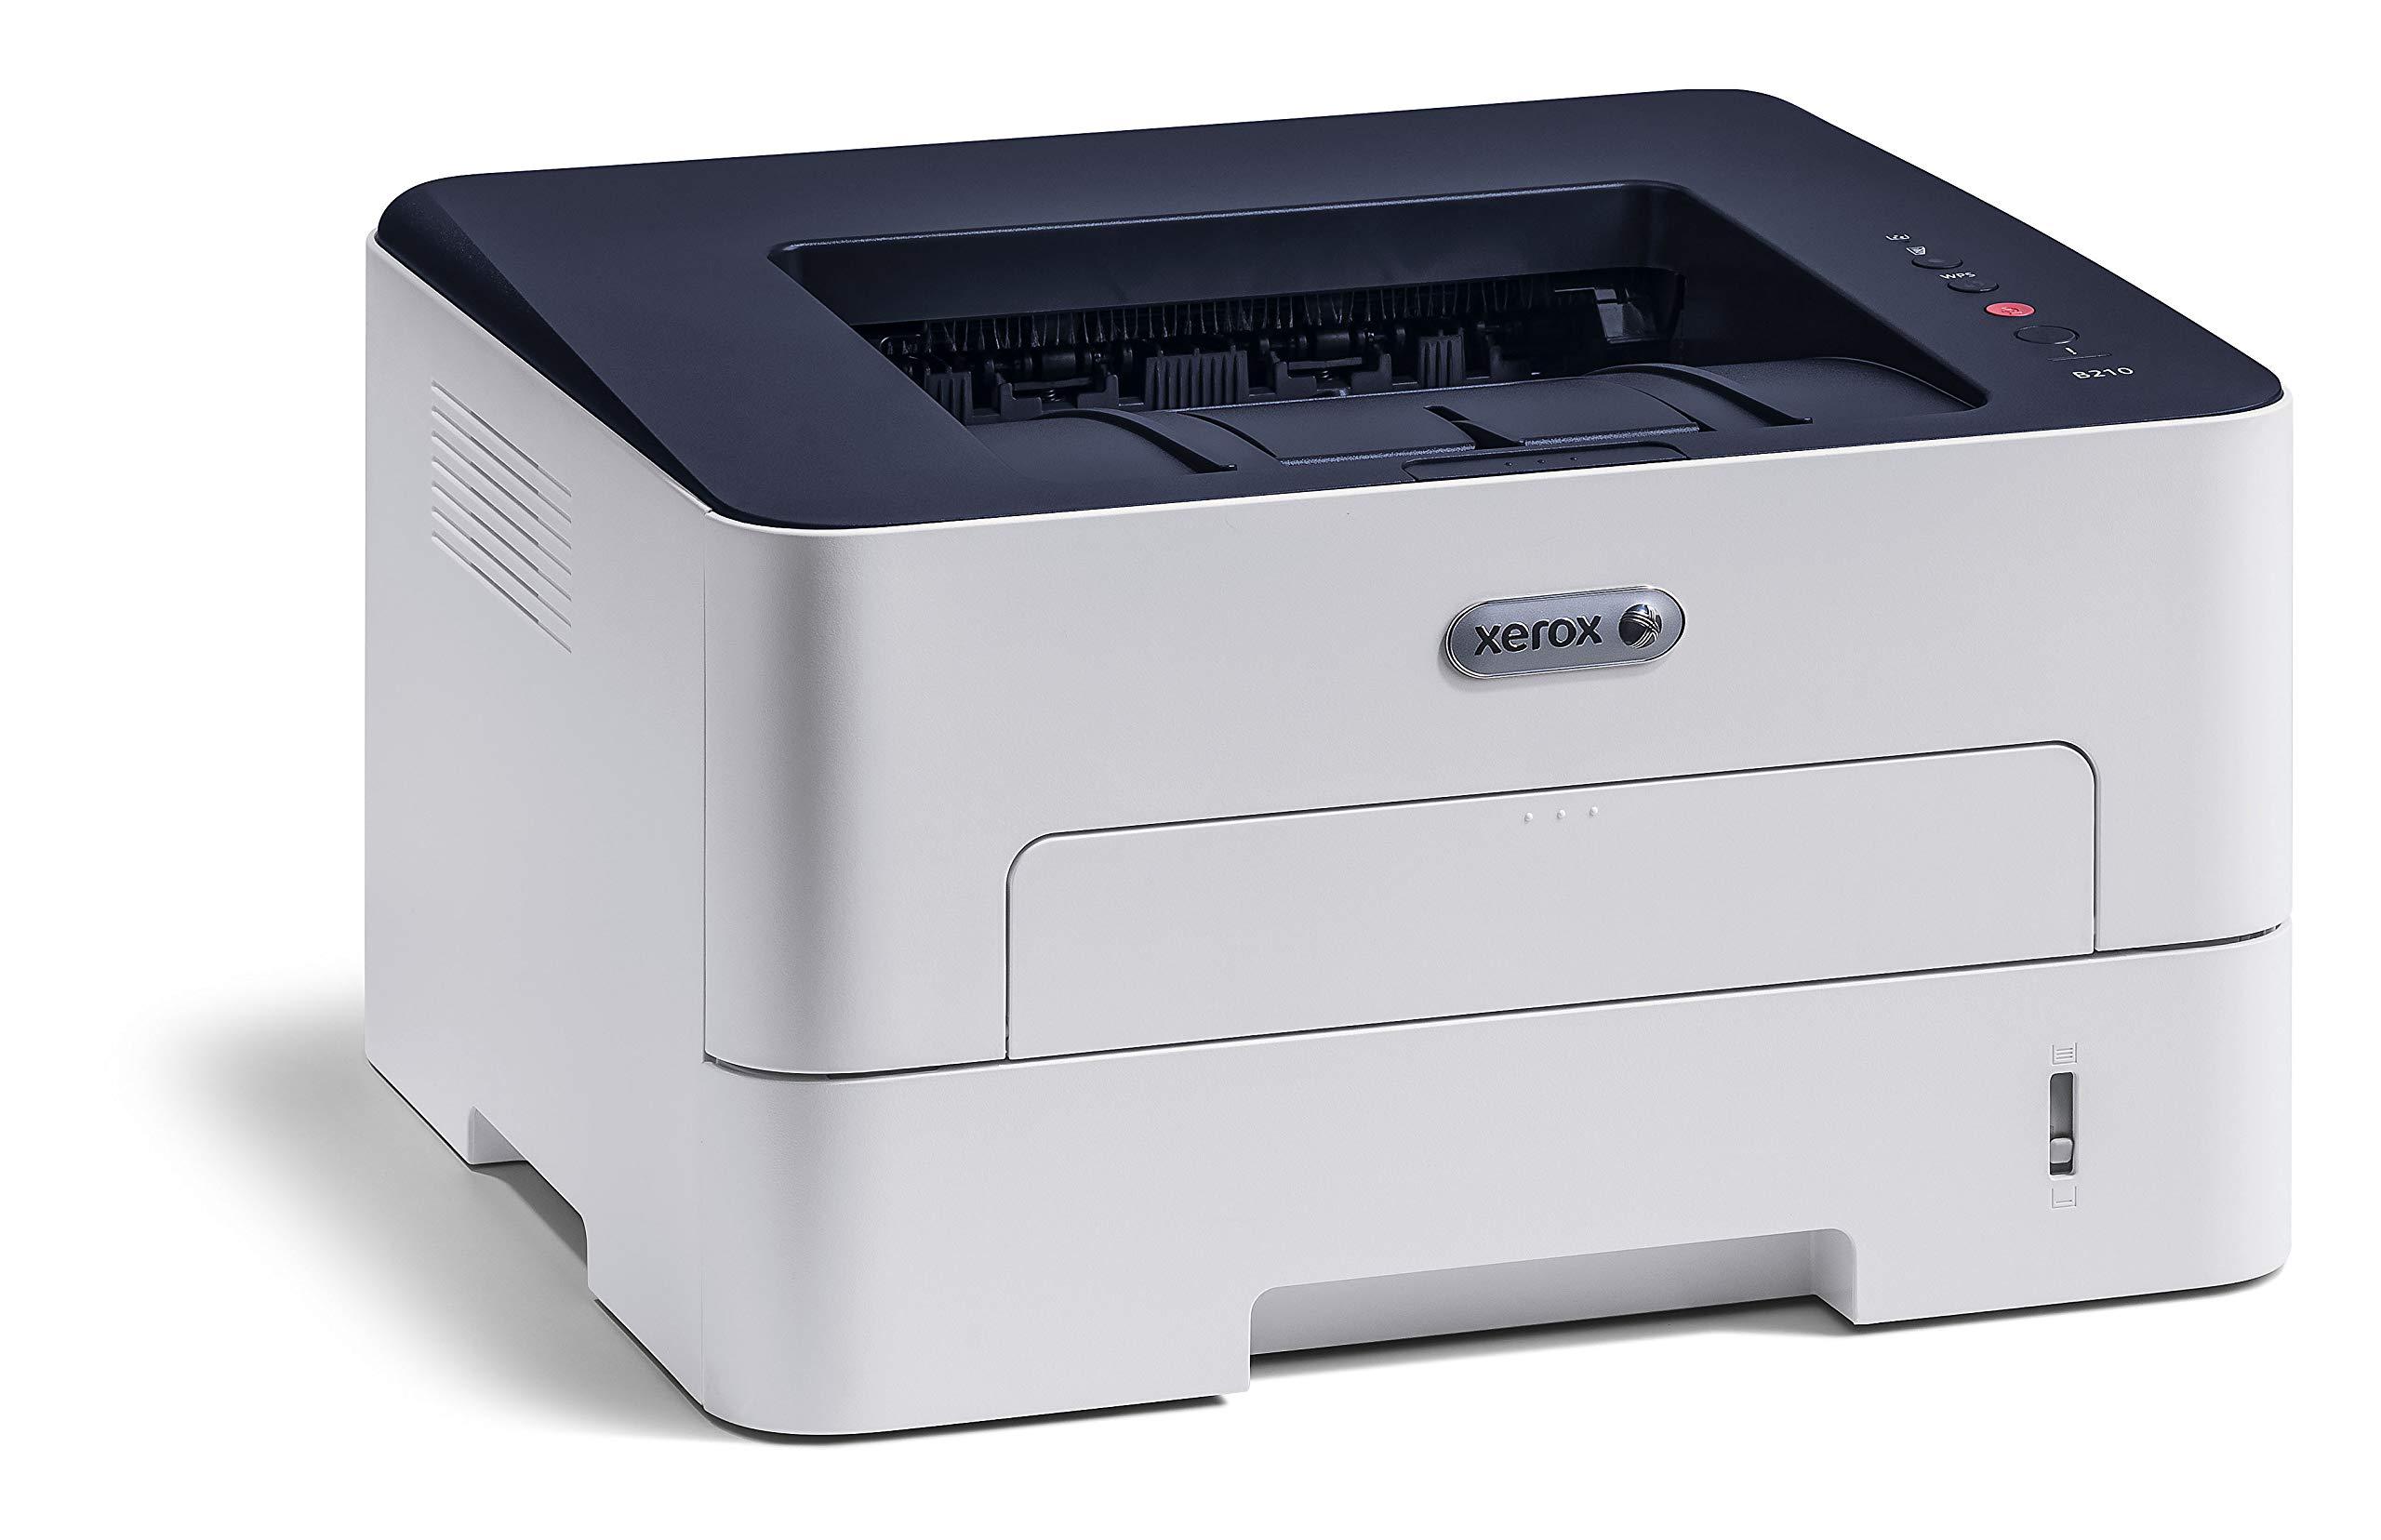 Xerox B210DNI Monochrome Laser Printer by Xerox